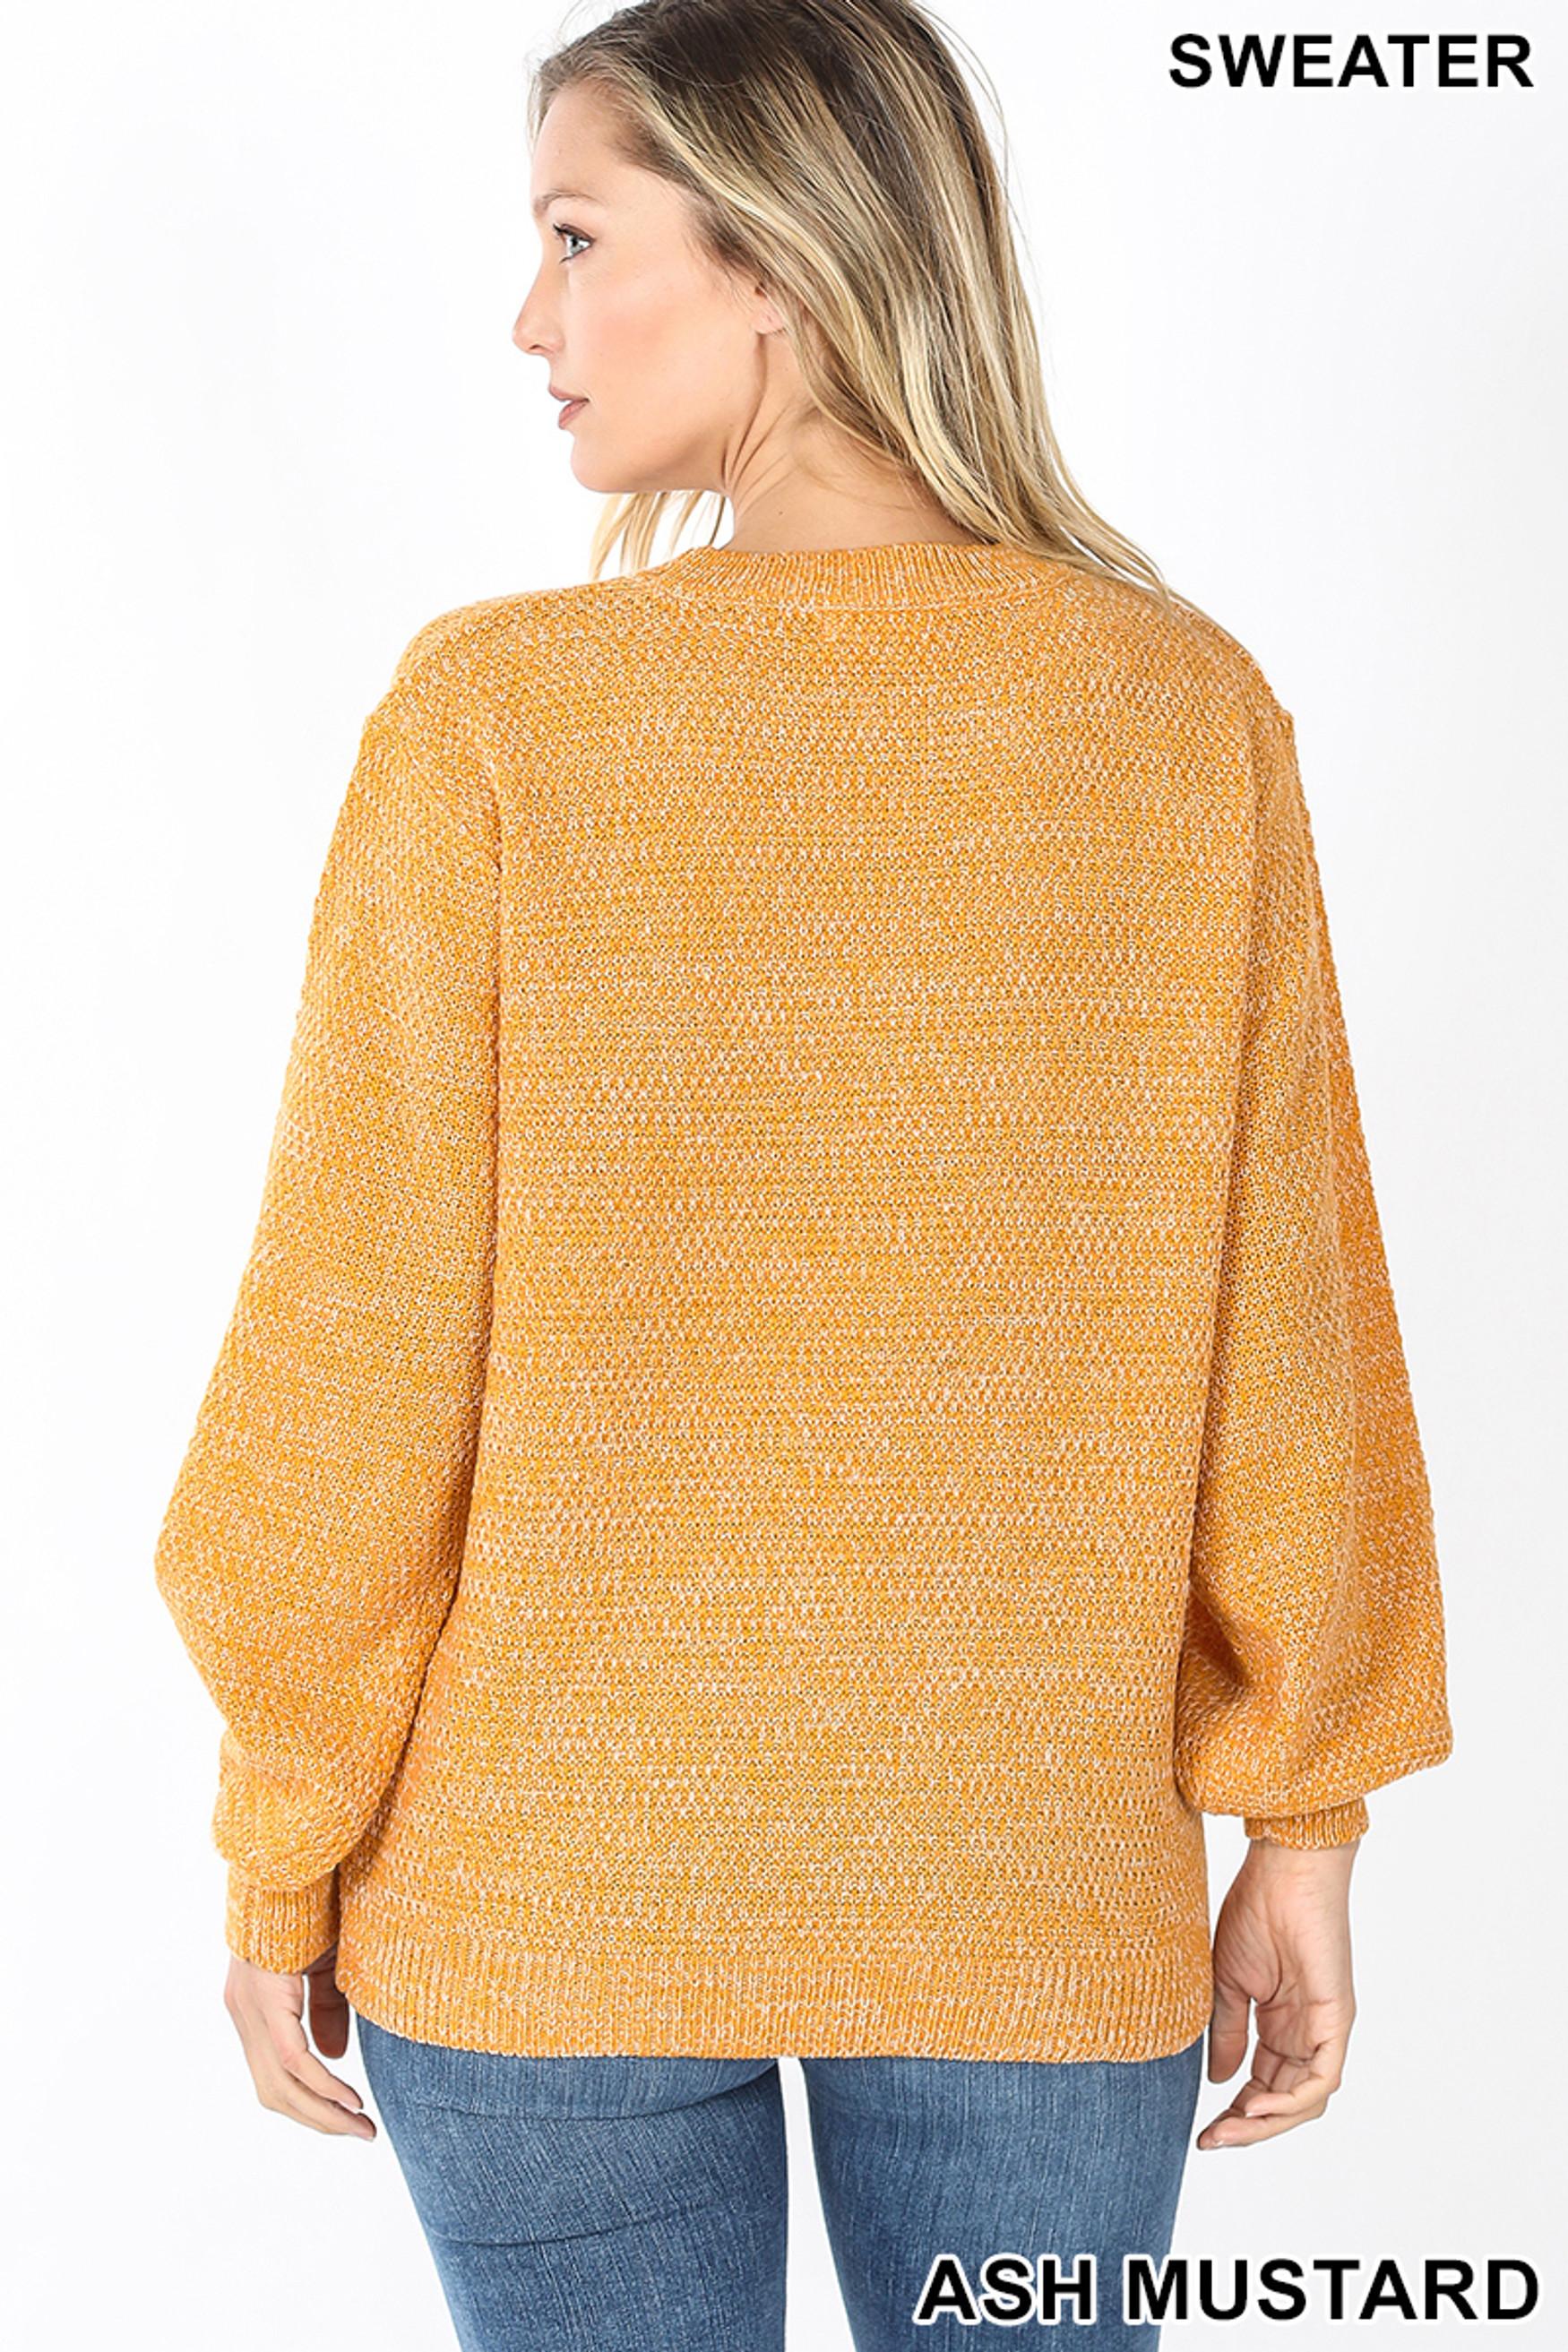 Back image of Ash Mustard Balloon Sleeve Melange Sweater